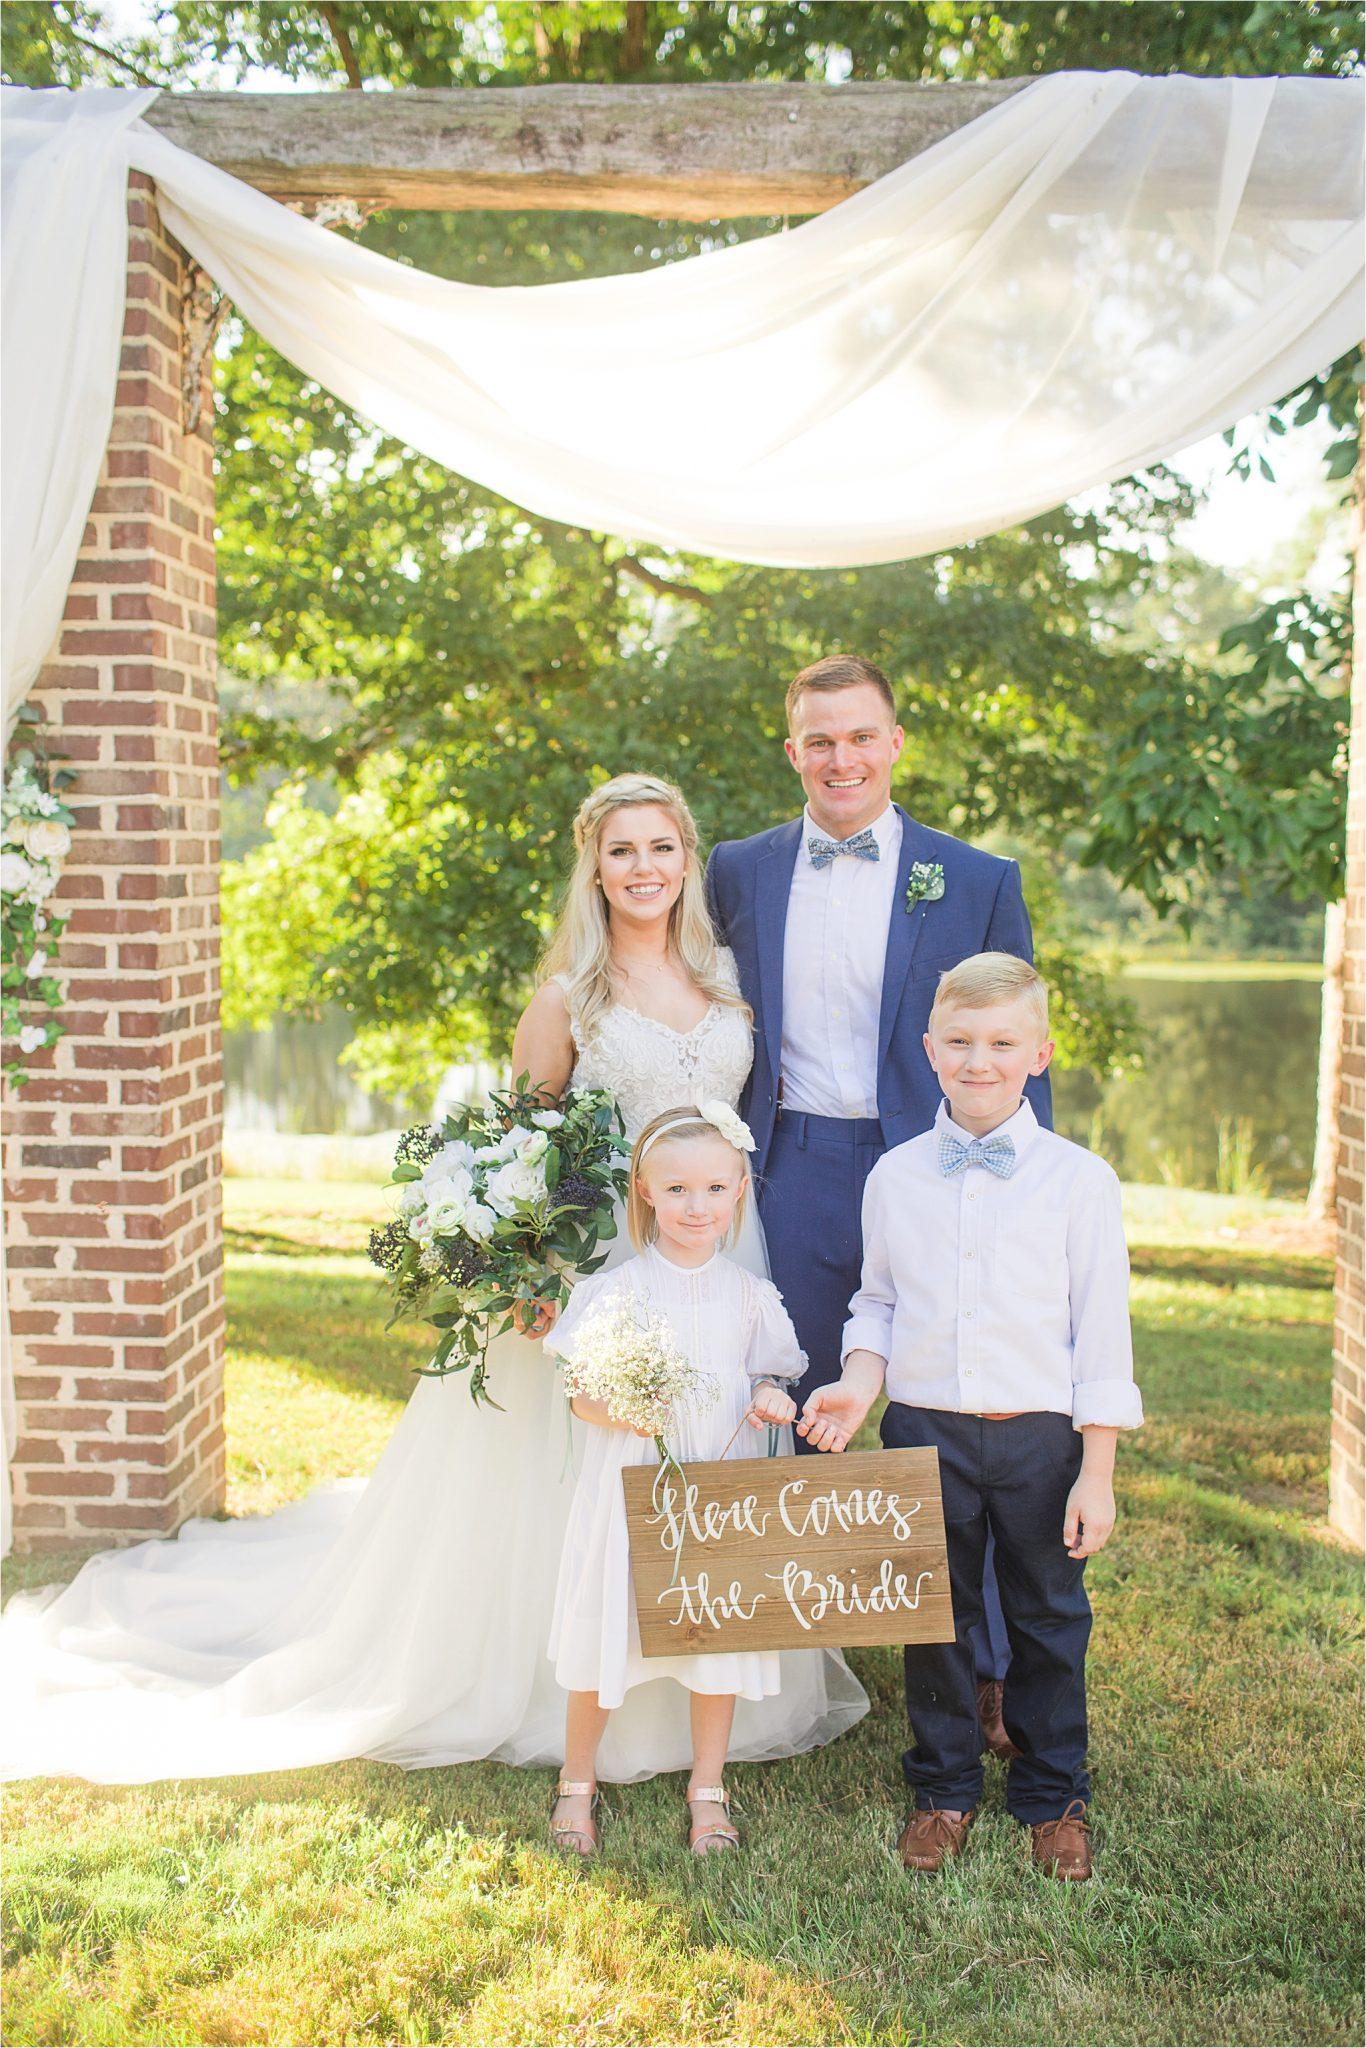 wedding-sign-here comes the bride-flower-girl-ring-bearer-bride-groom